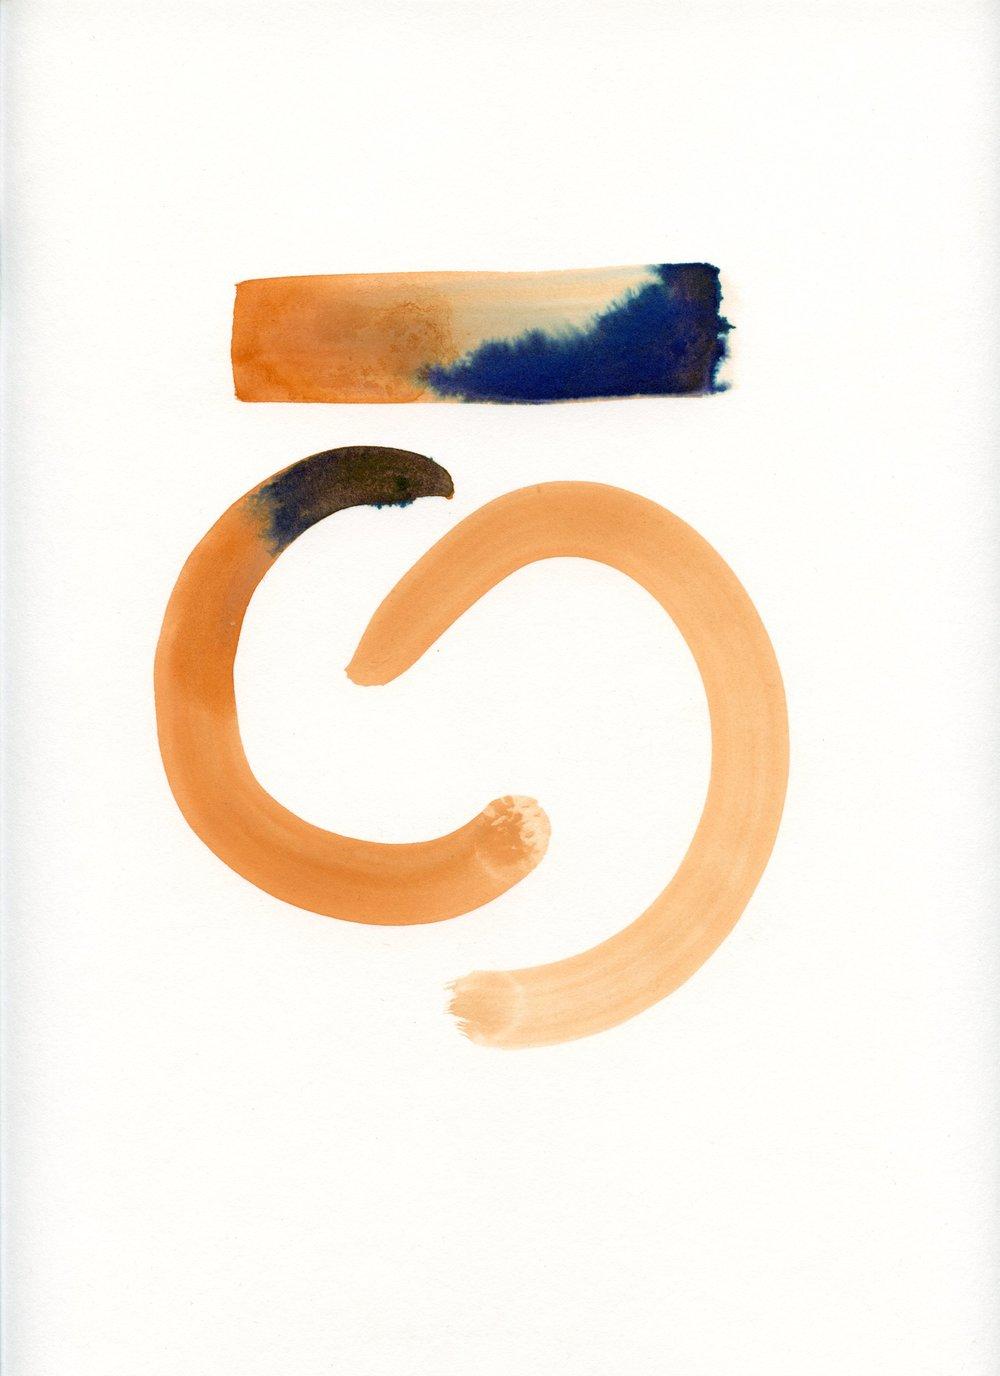 orangeblue006.jpg